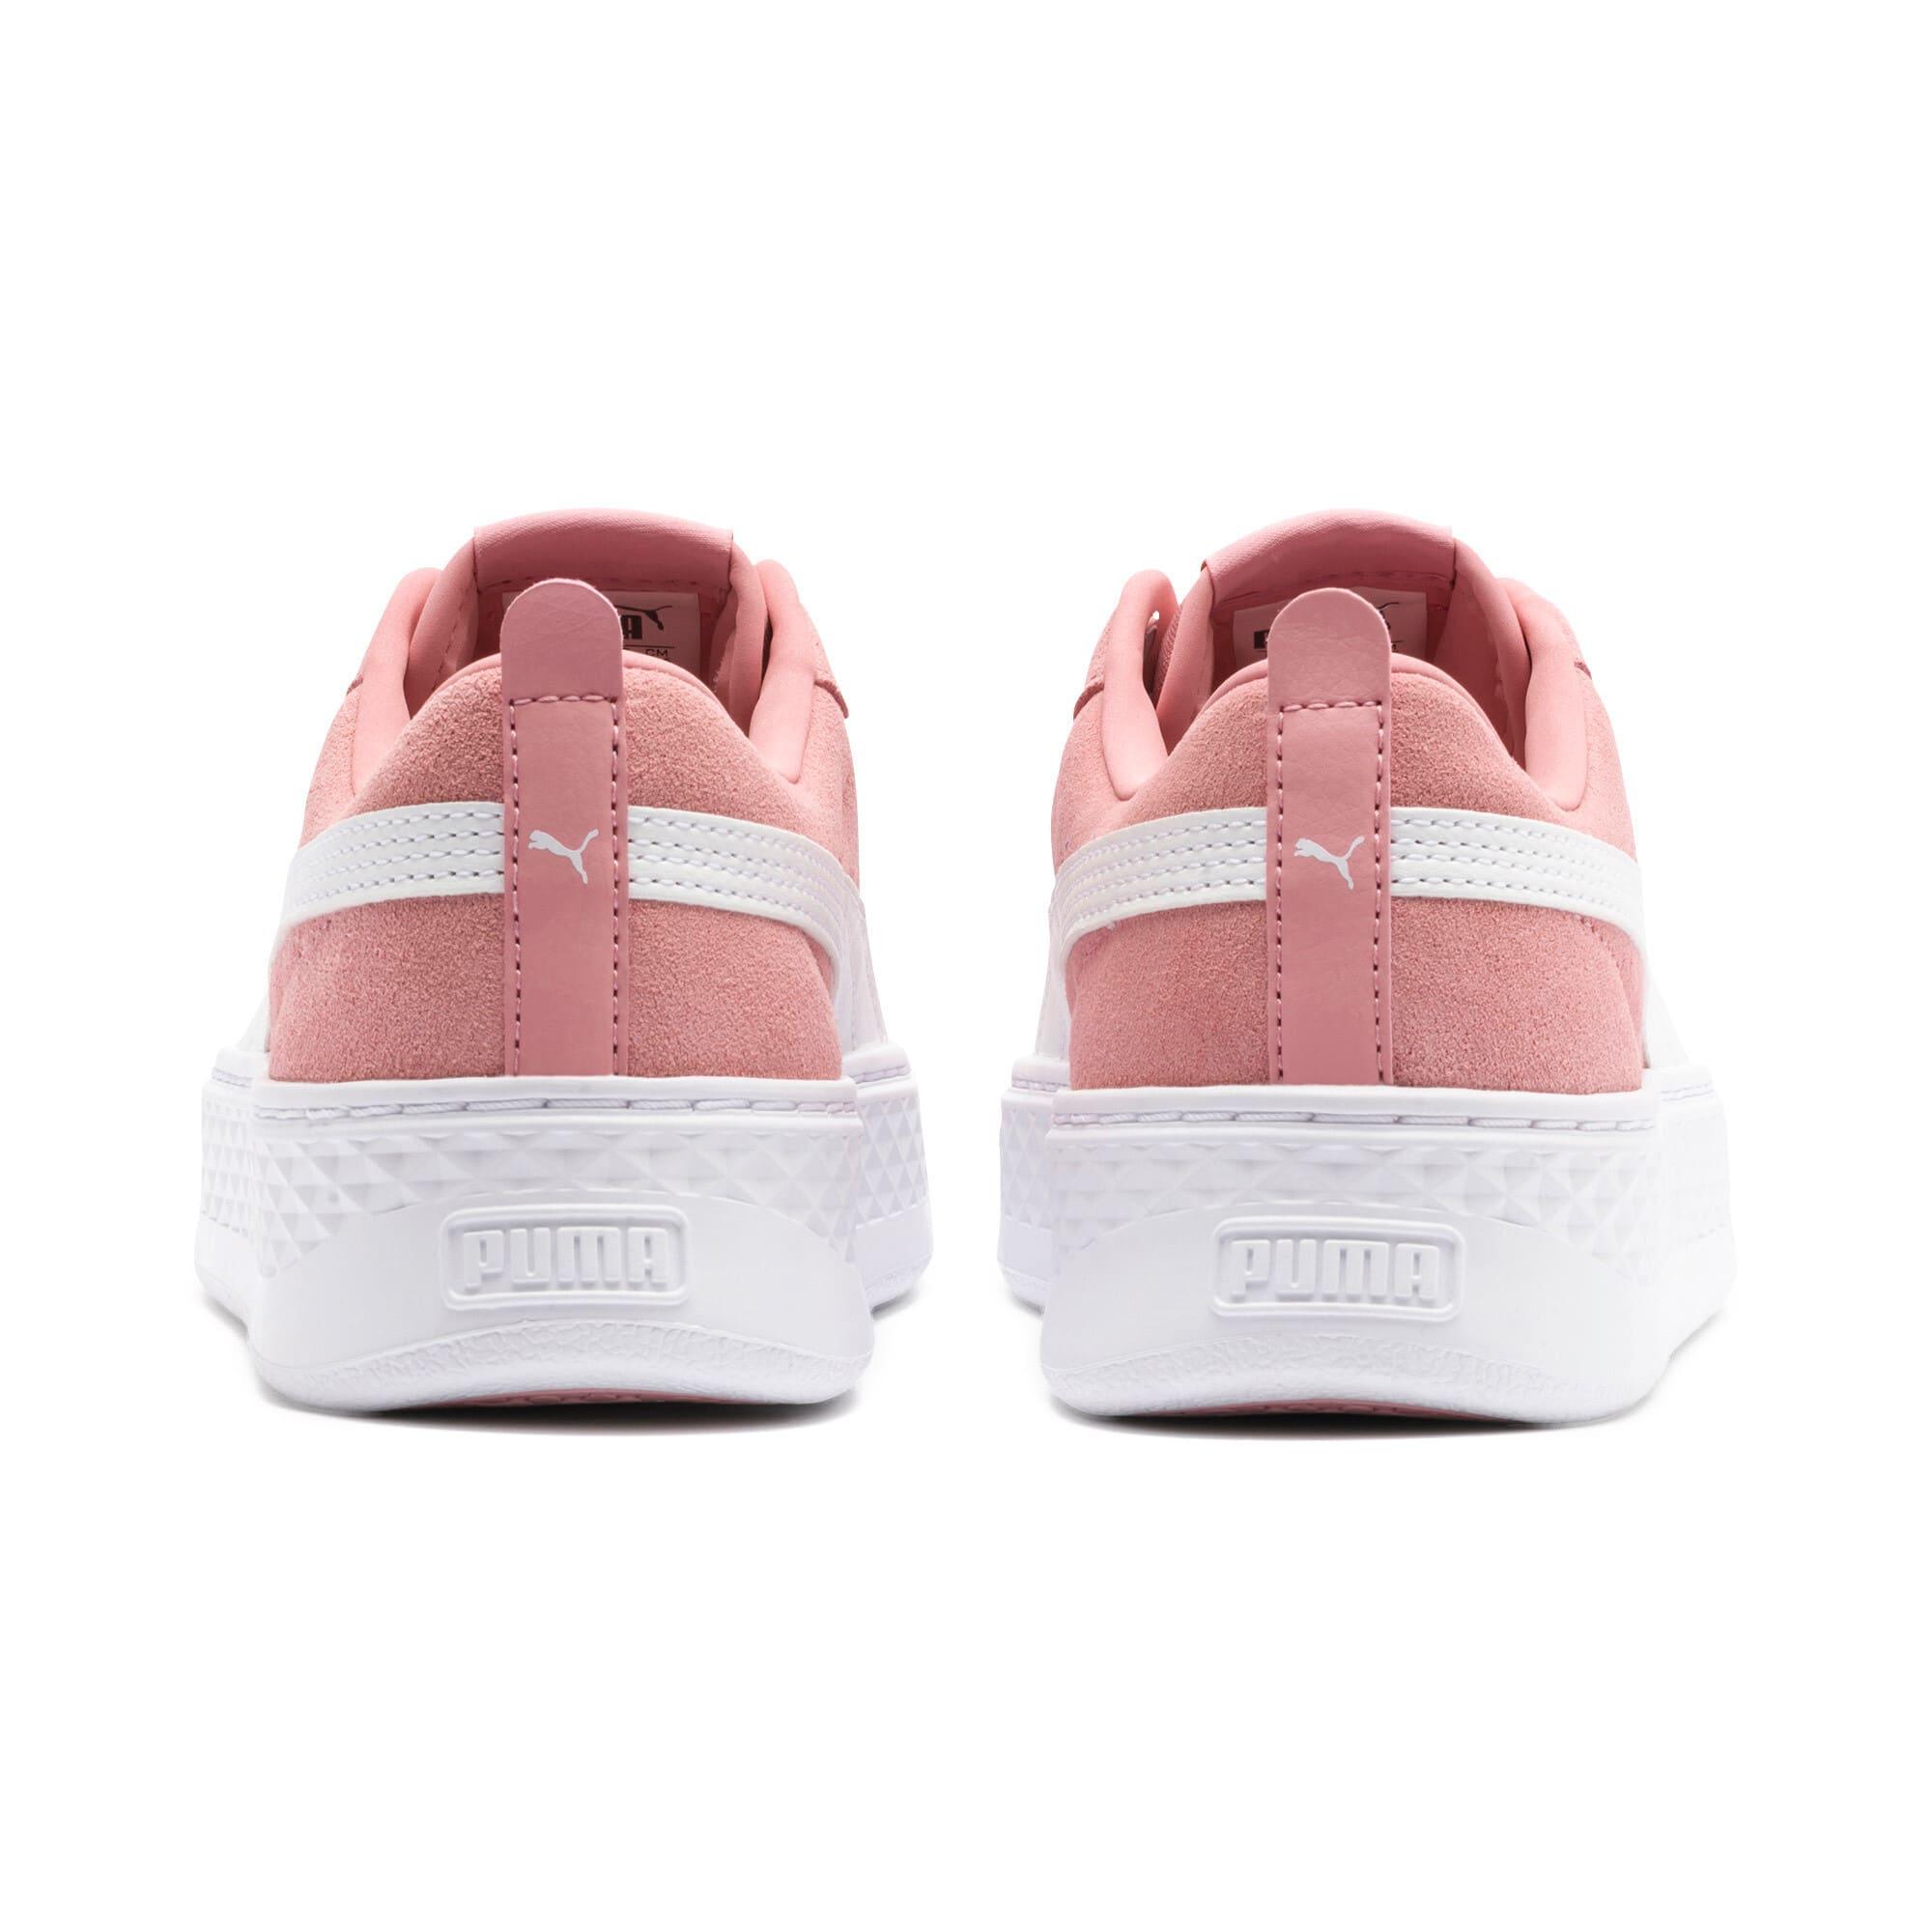 Thumbnail 4 of PUMA Smash Platform Suede Women's Sneakers, Bridal Rose-Puma White-Gold, medium